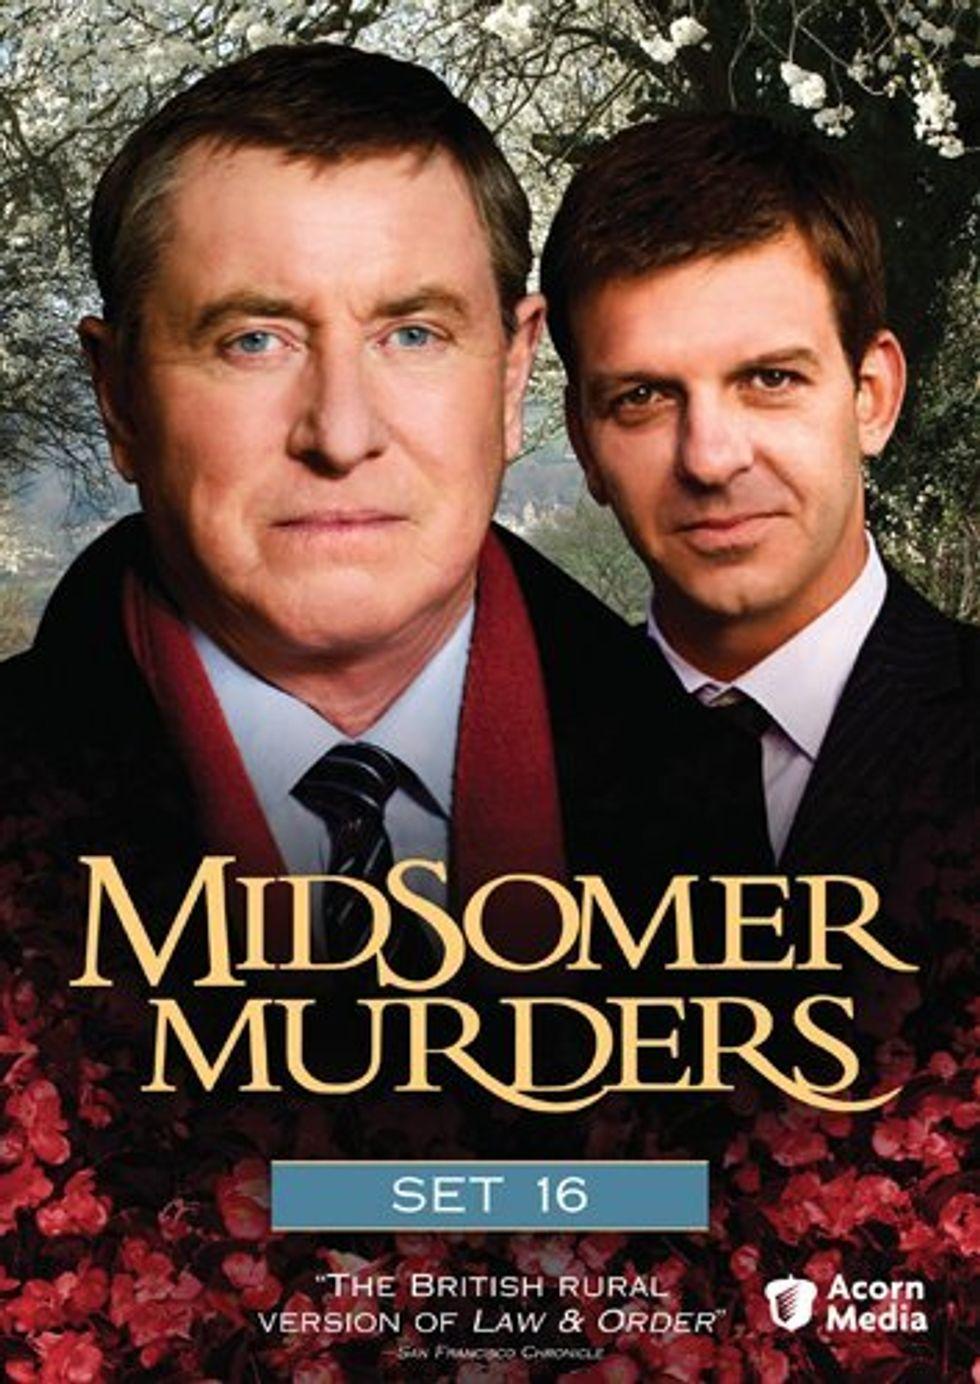 More Marvelous Mysteries -- Midsomer Murders Set 16 On DVD